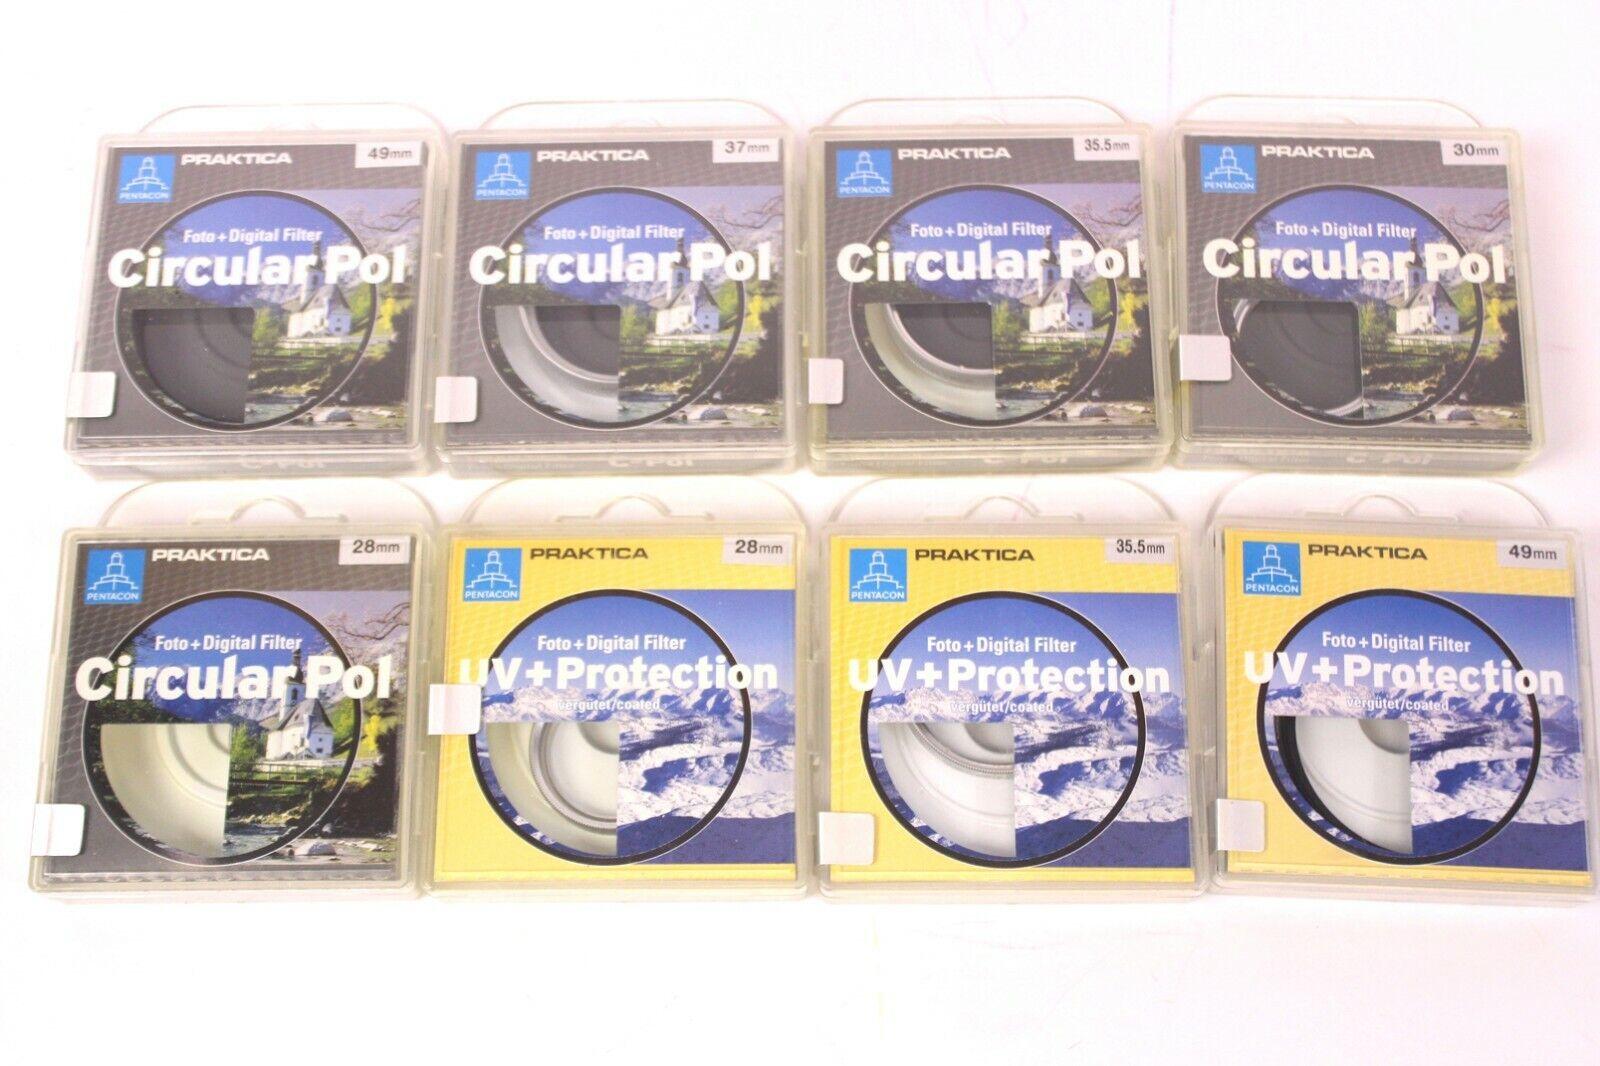 42 tlg. Set Praktica Foto Digital Filter UV+ Protection Circular Pol 28 - 49 mm